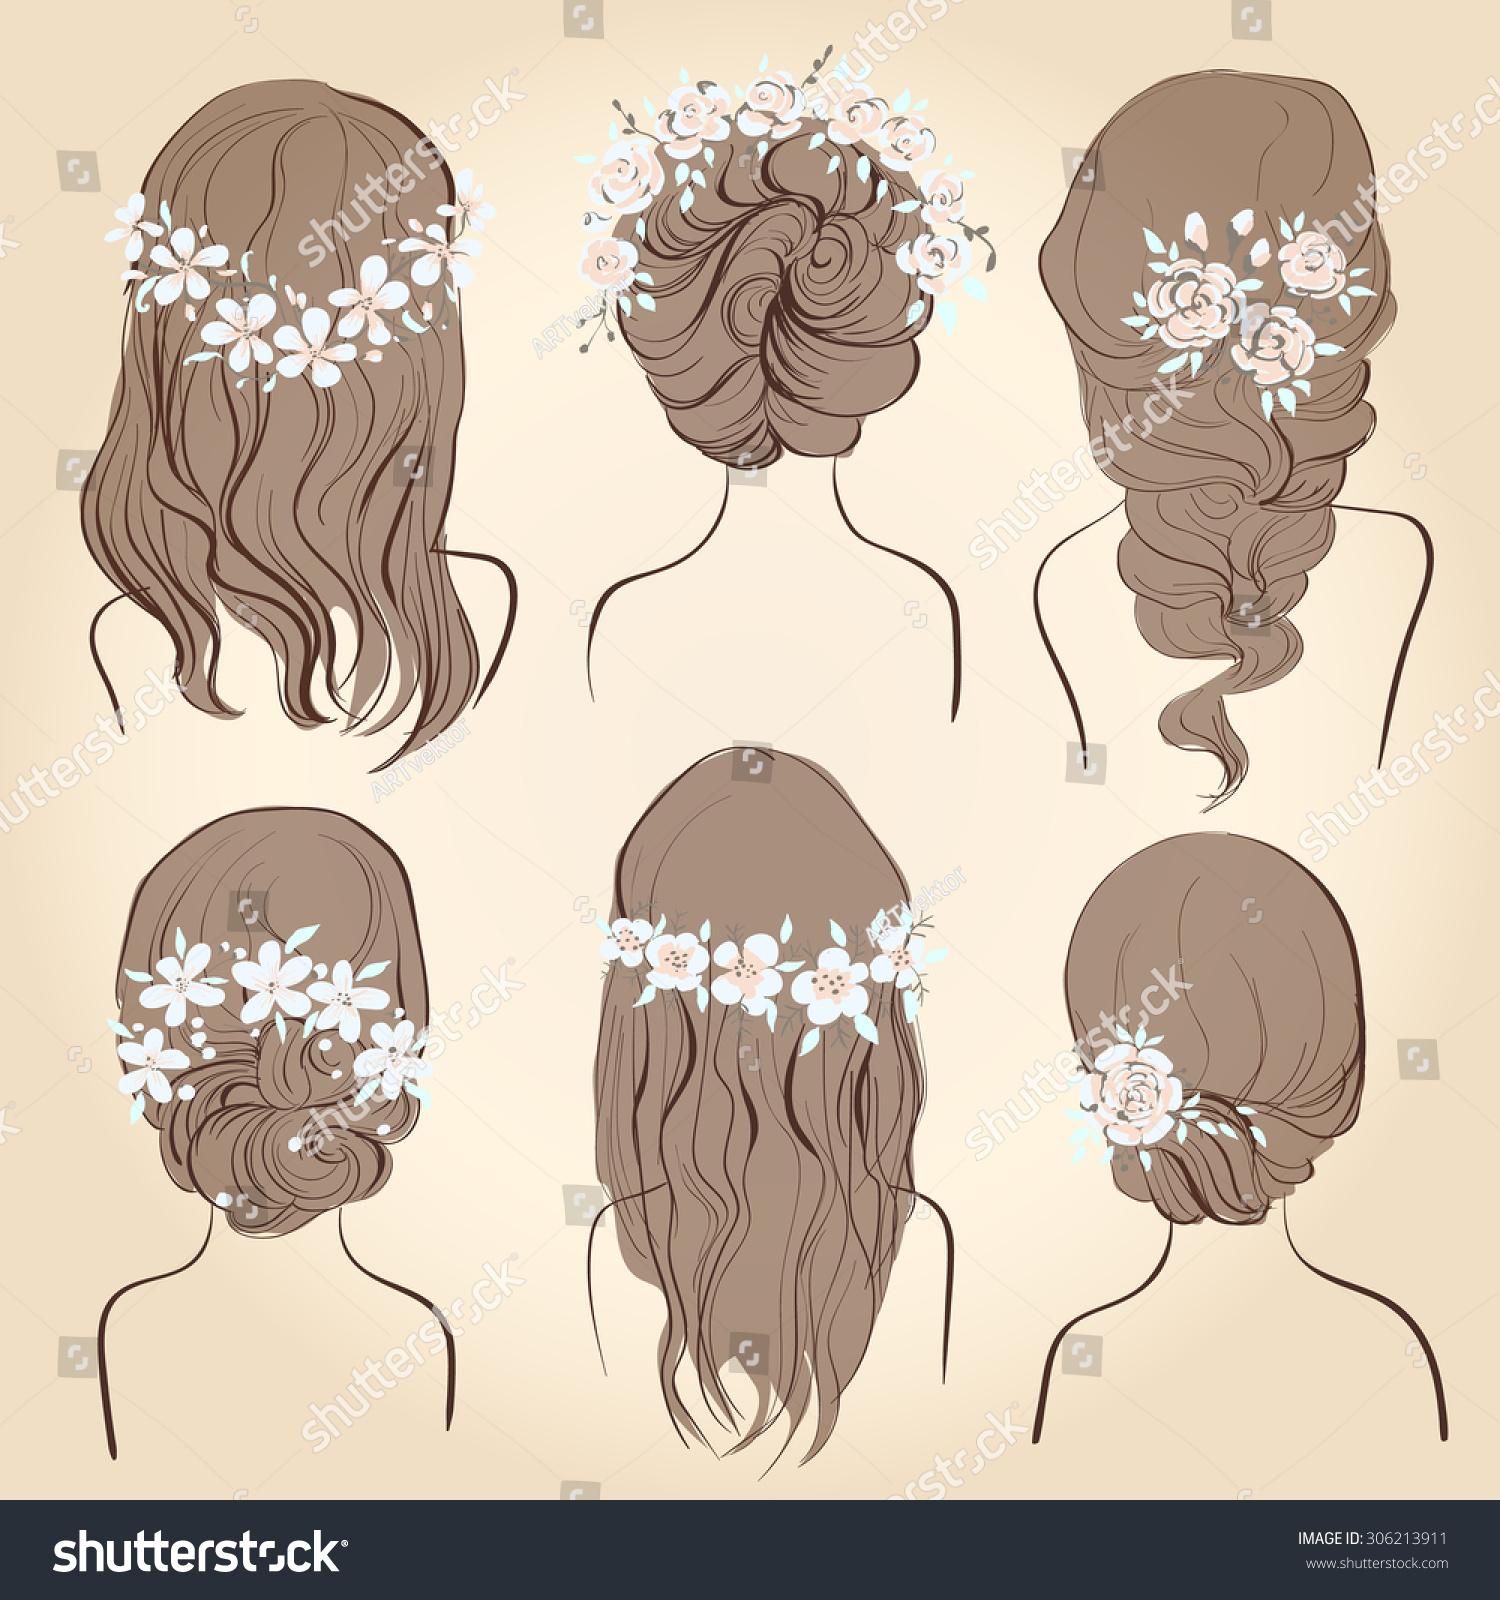 Set Different Vintage Style Hairstyles Wedding Stock Illustration ...